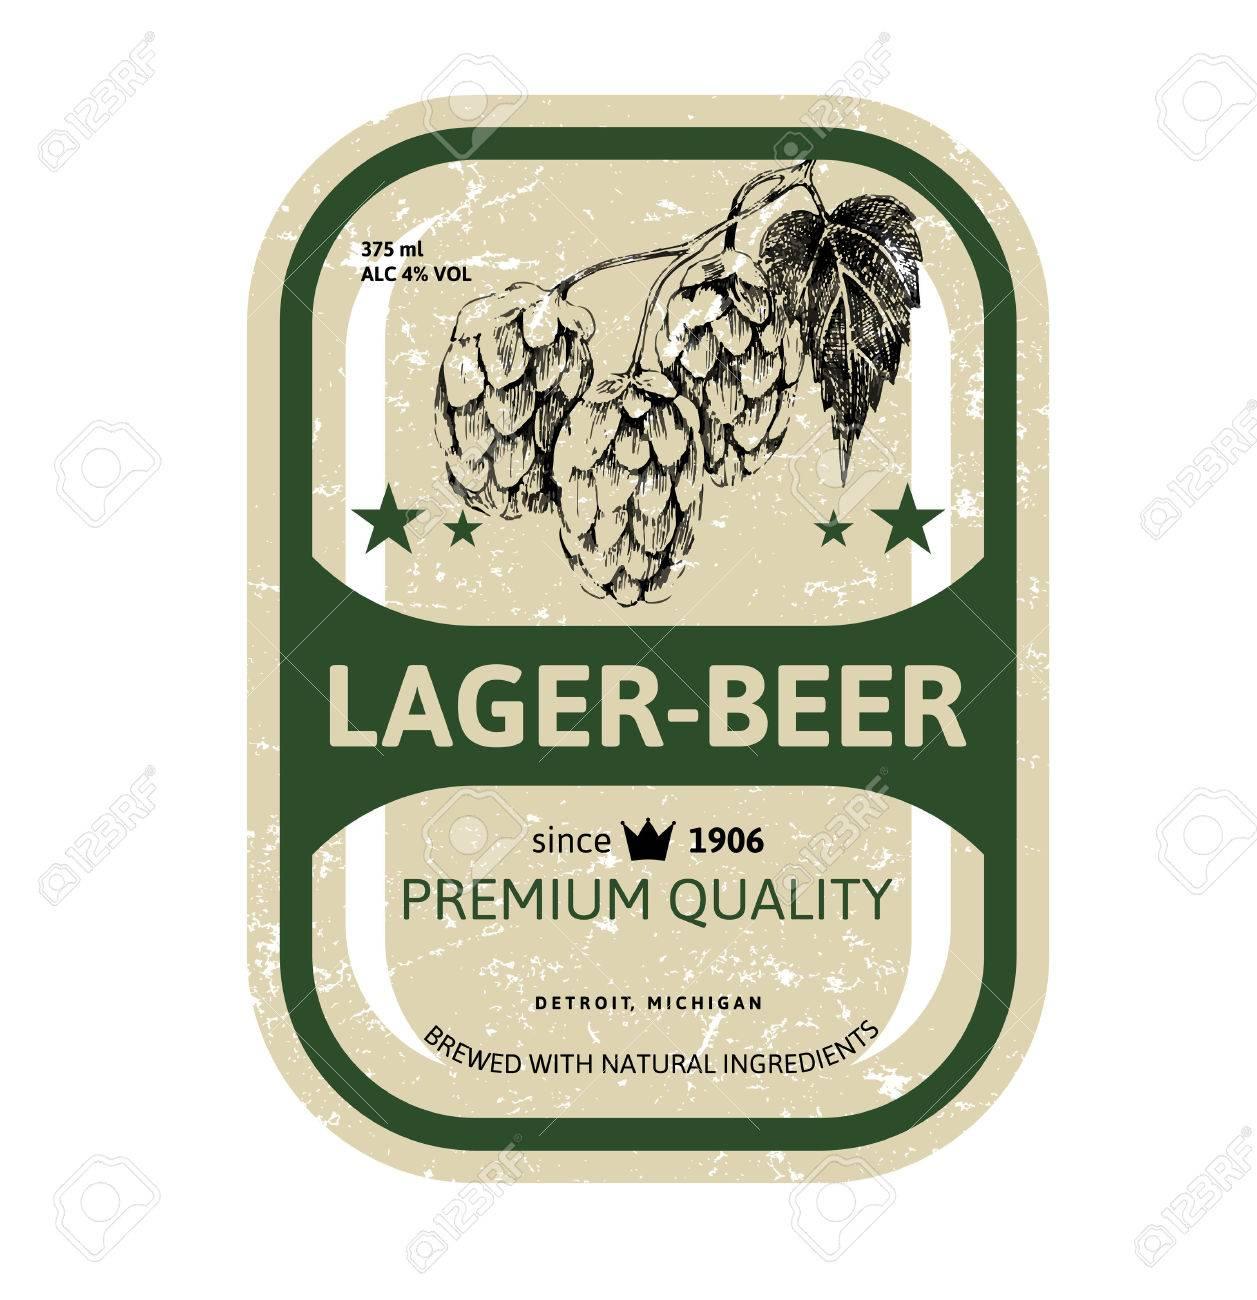 Beer label design with hand drawn hop brunch - 48364414